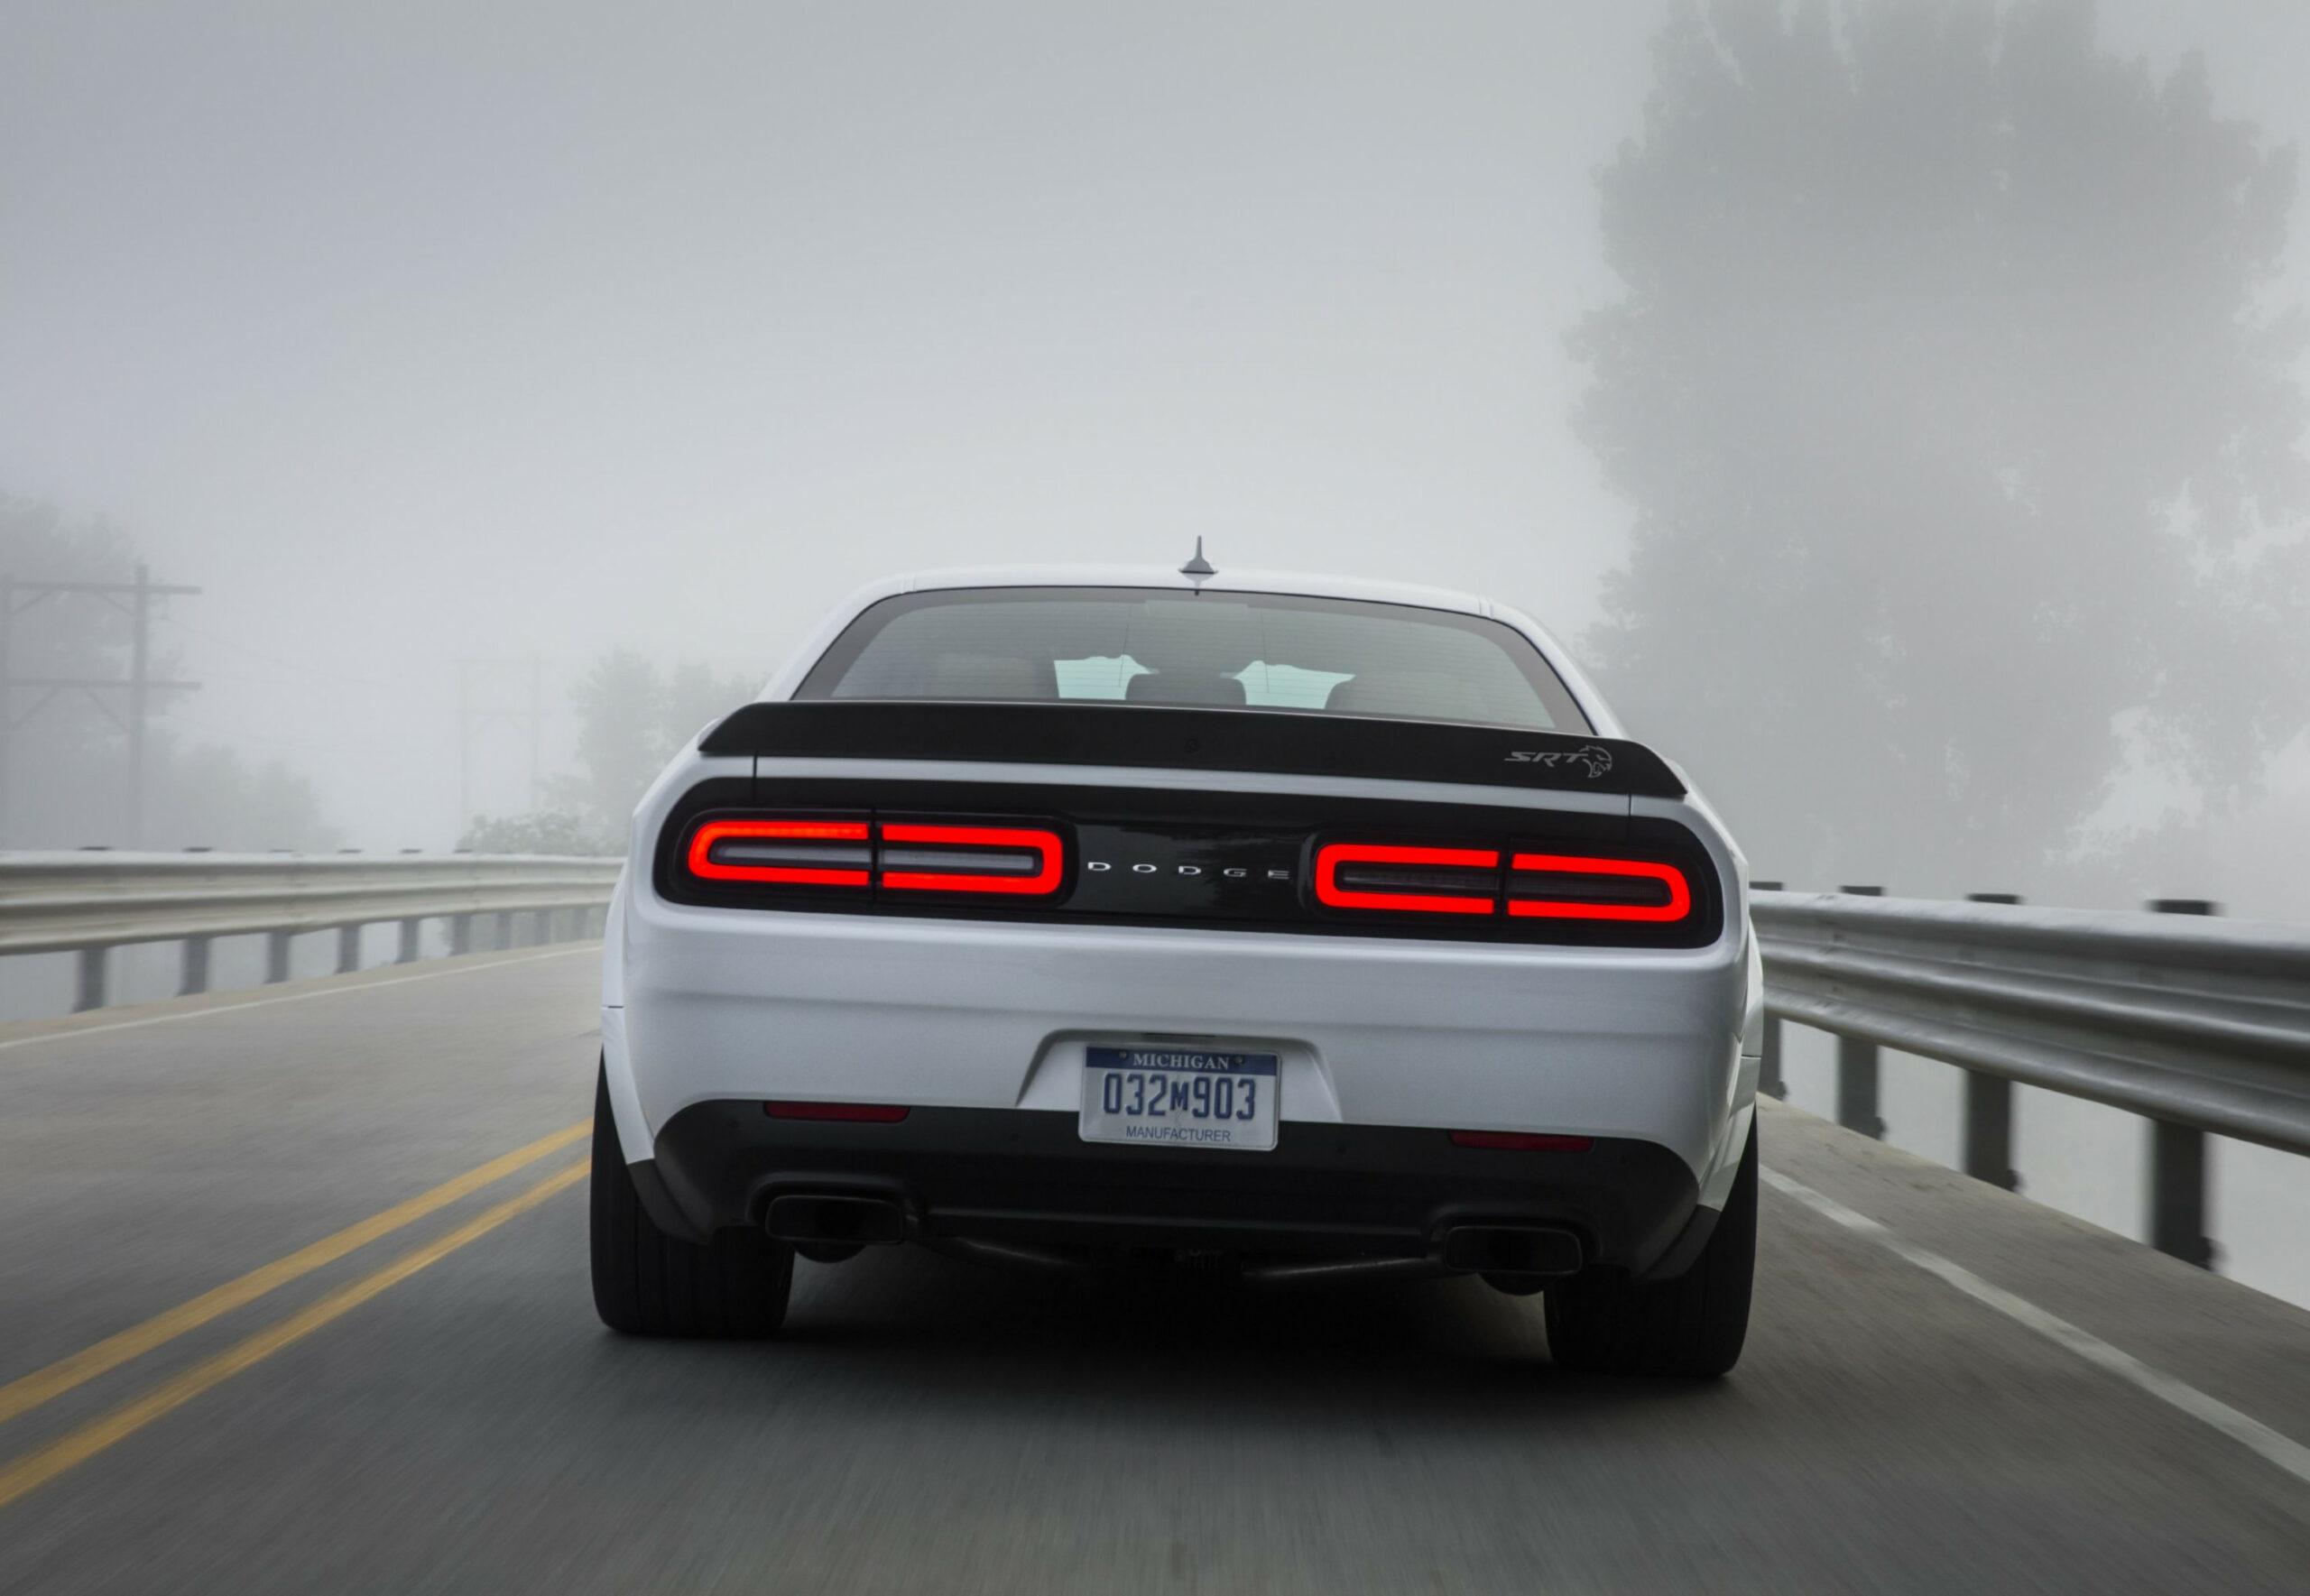 Pictures Dodge Challenger Concept 2022